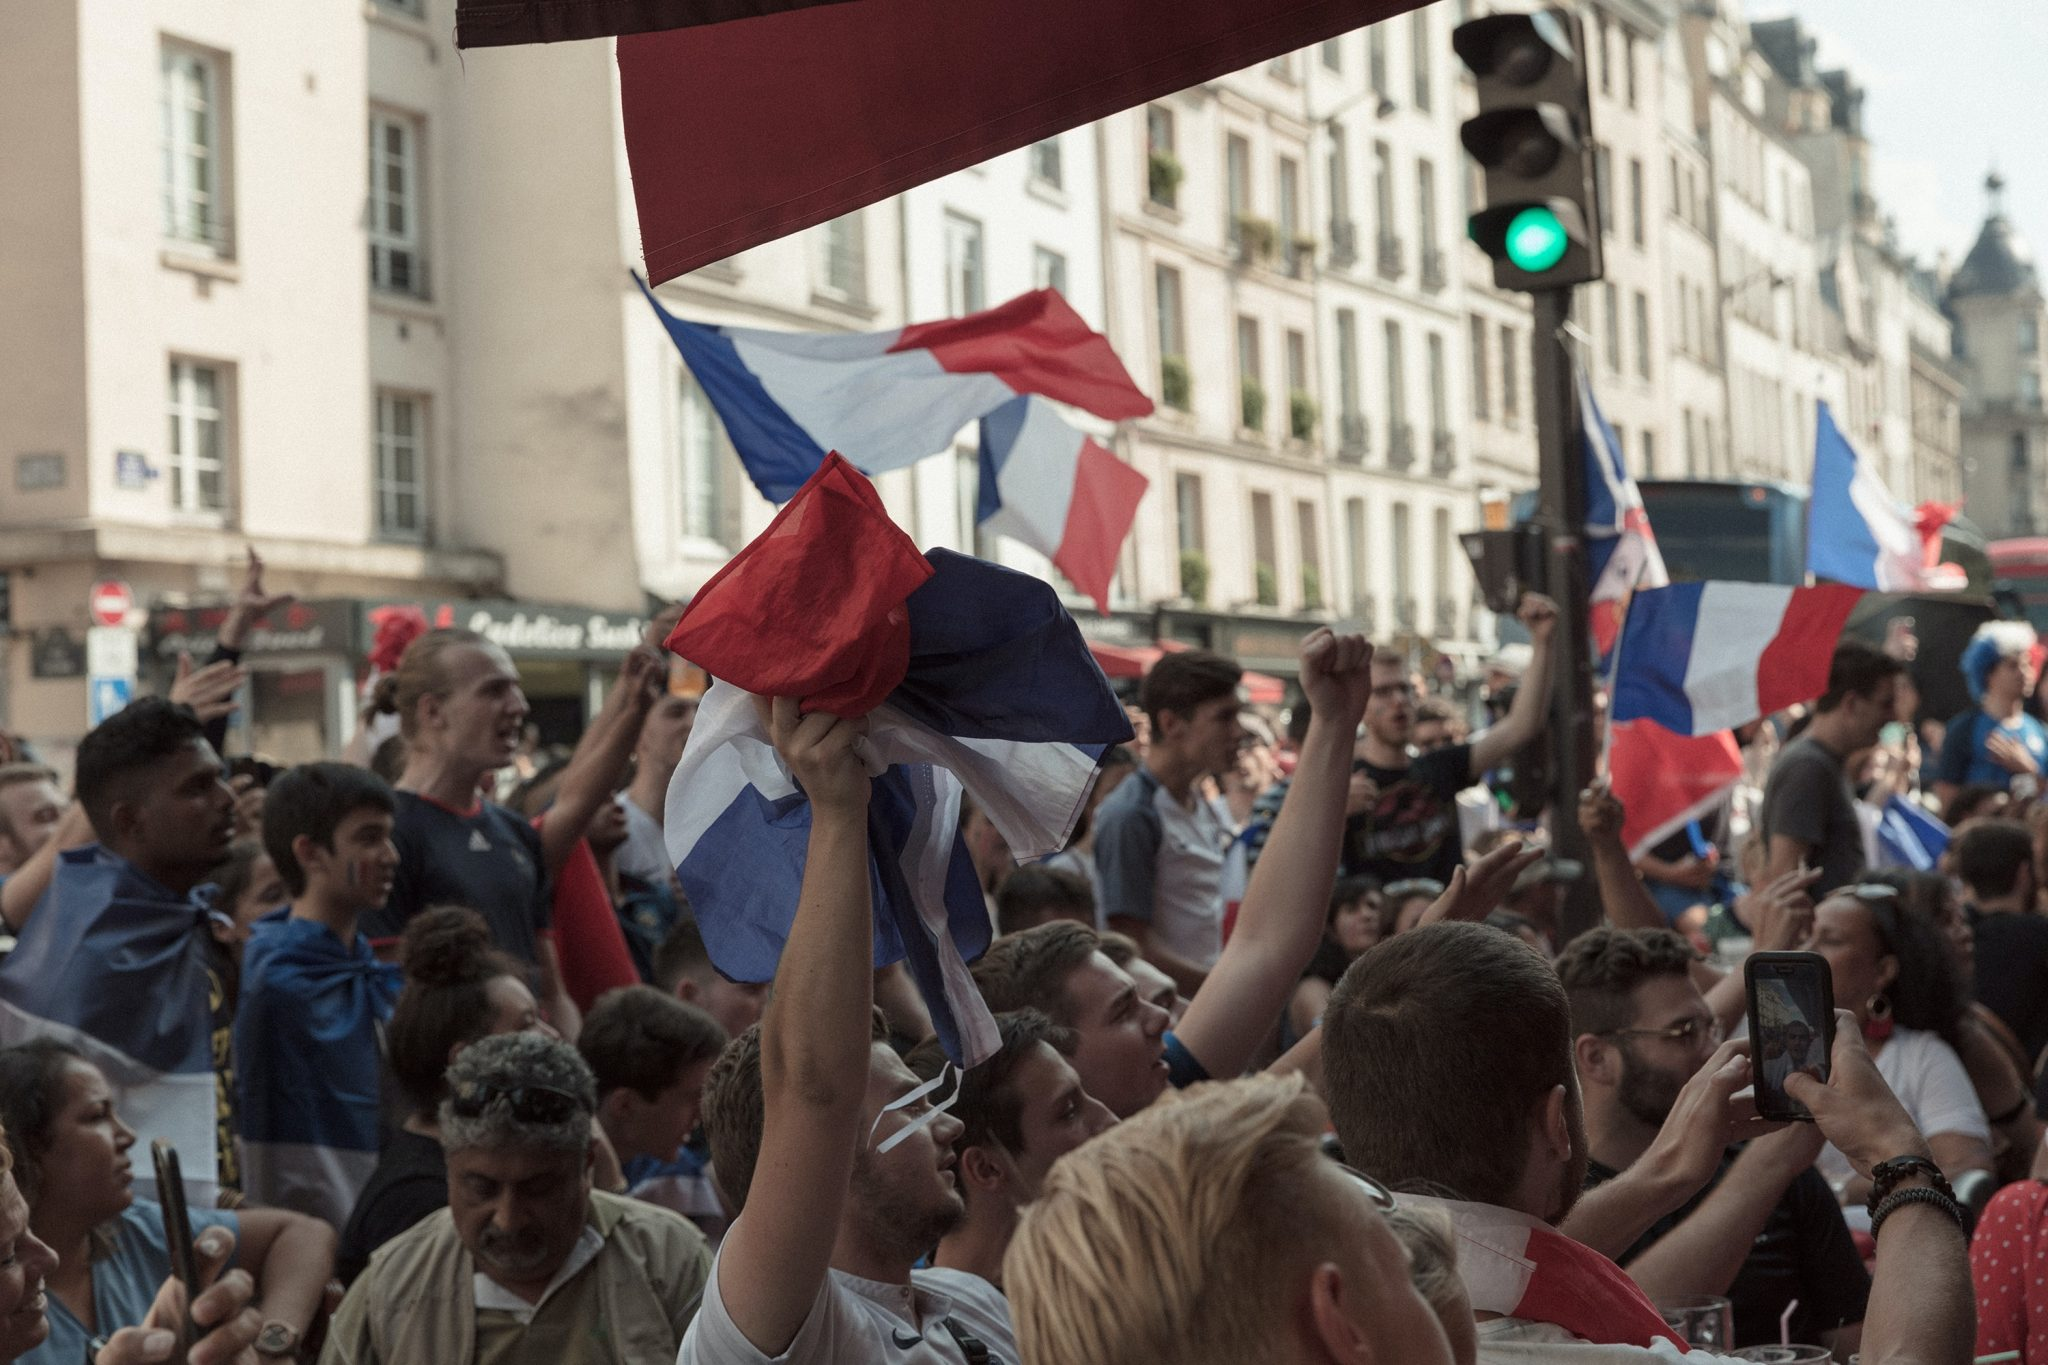 Foto: Proteste in Frankreich. Foto: Khamkéo Vilaysing / unsplash